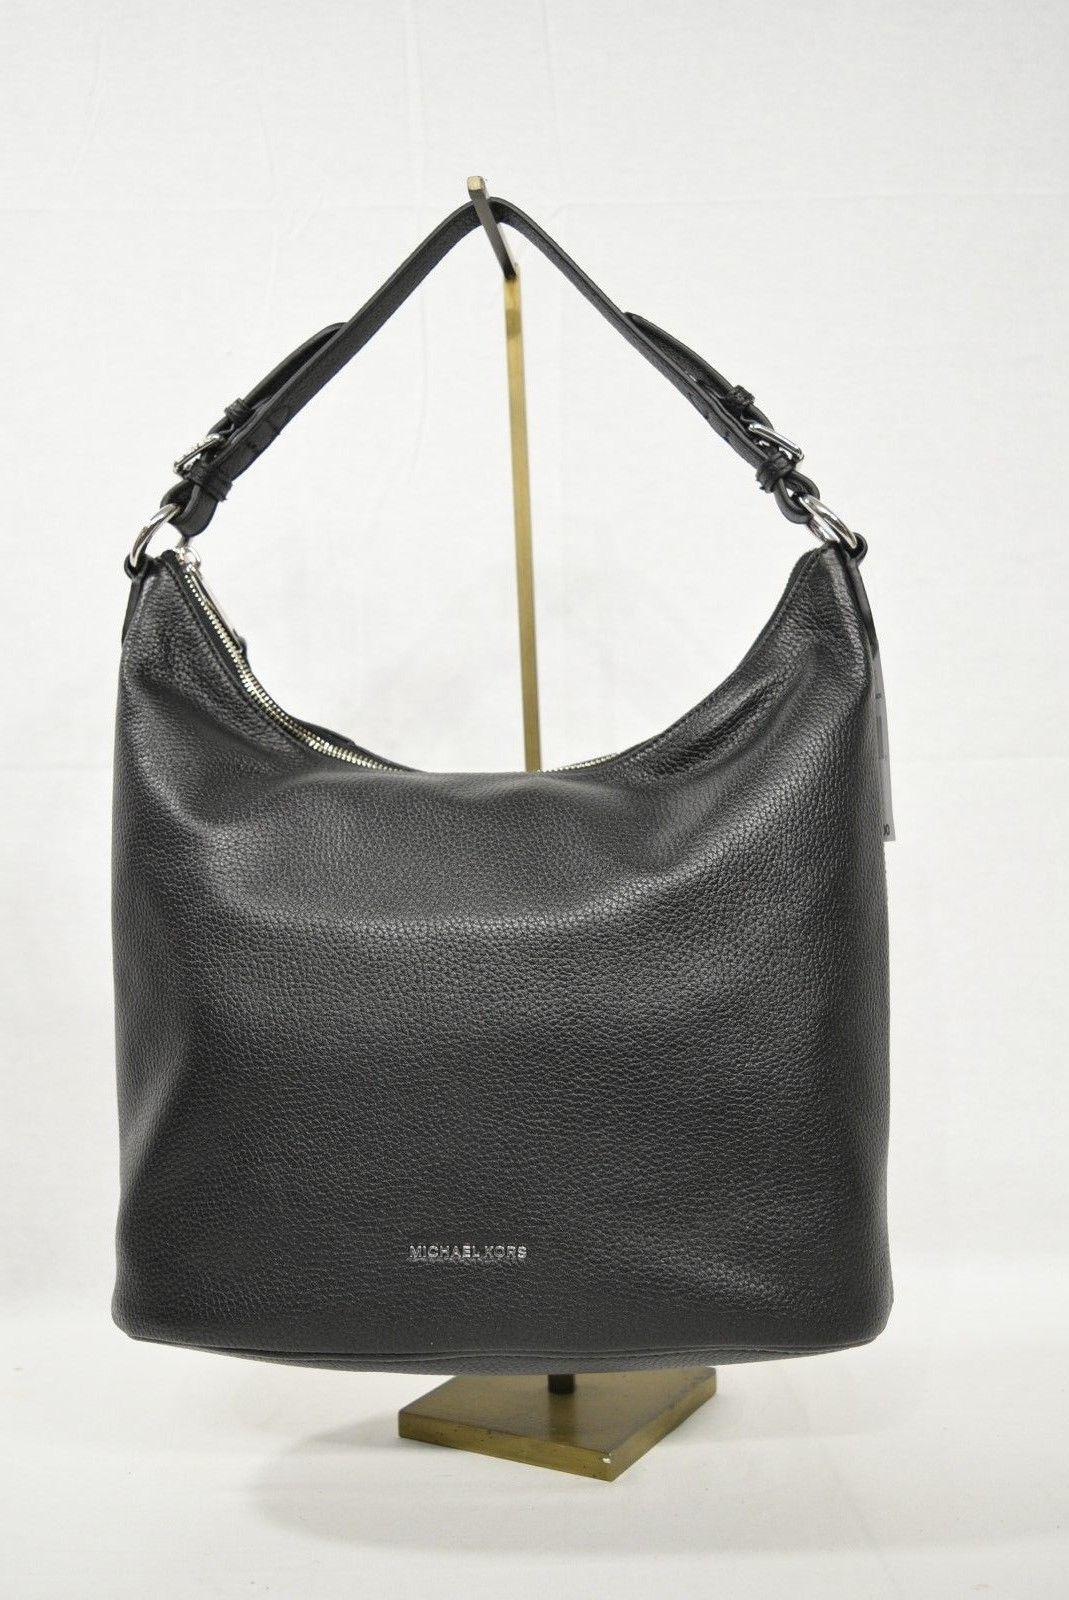 551ec932a2 NWT Michael Kors Lupita Large Leather Convertible Hobo   Shoulder Bag in  Black